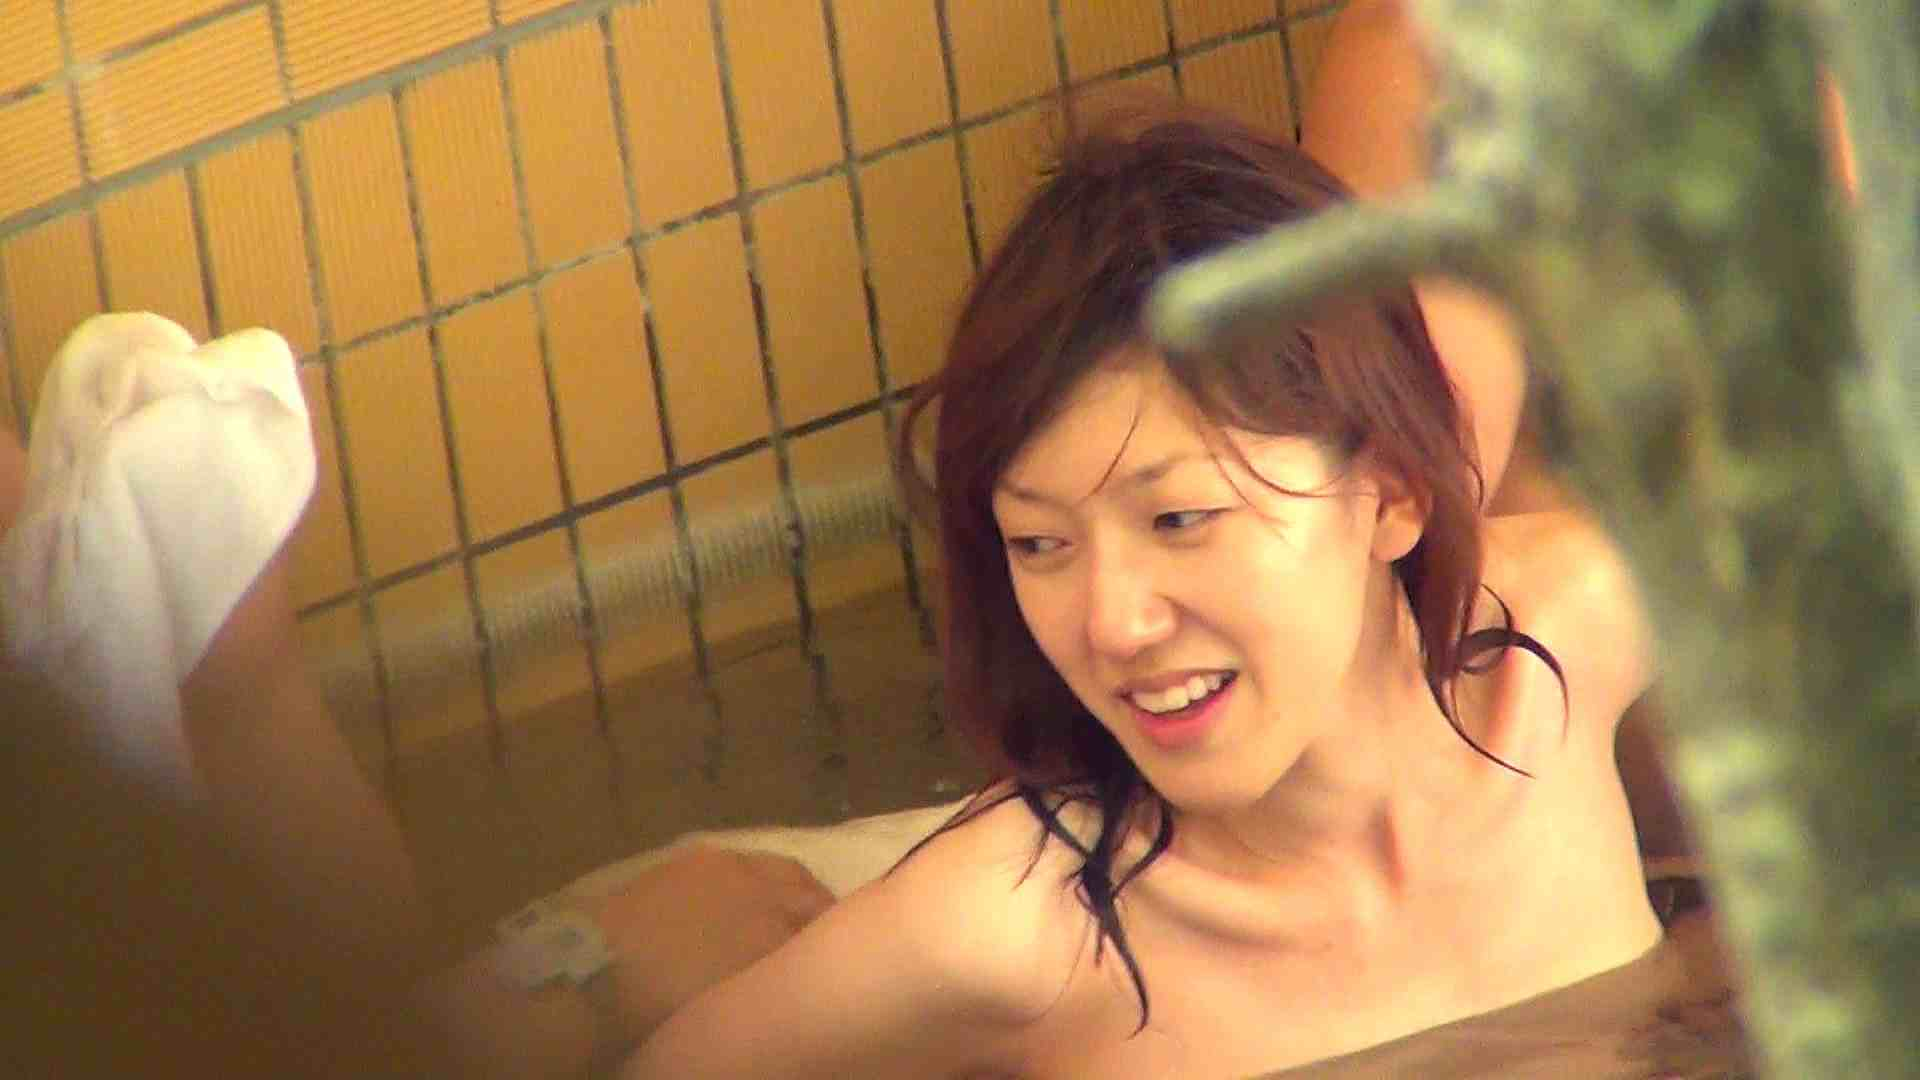 Vol.47 oyakoで登場 スレンダーだけどしっかりしたオッパイ 美女   潜伏露天風呂  24pic 22